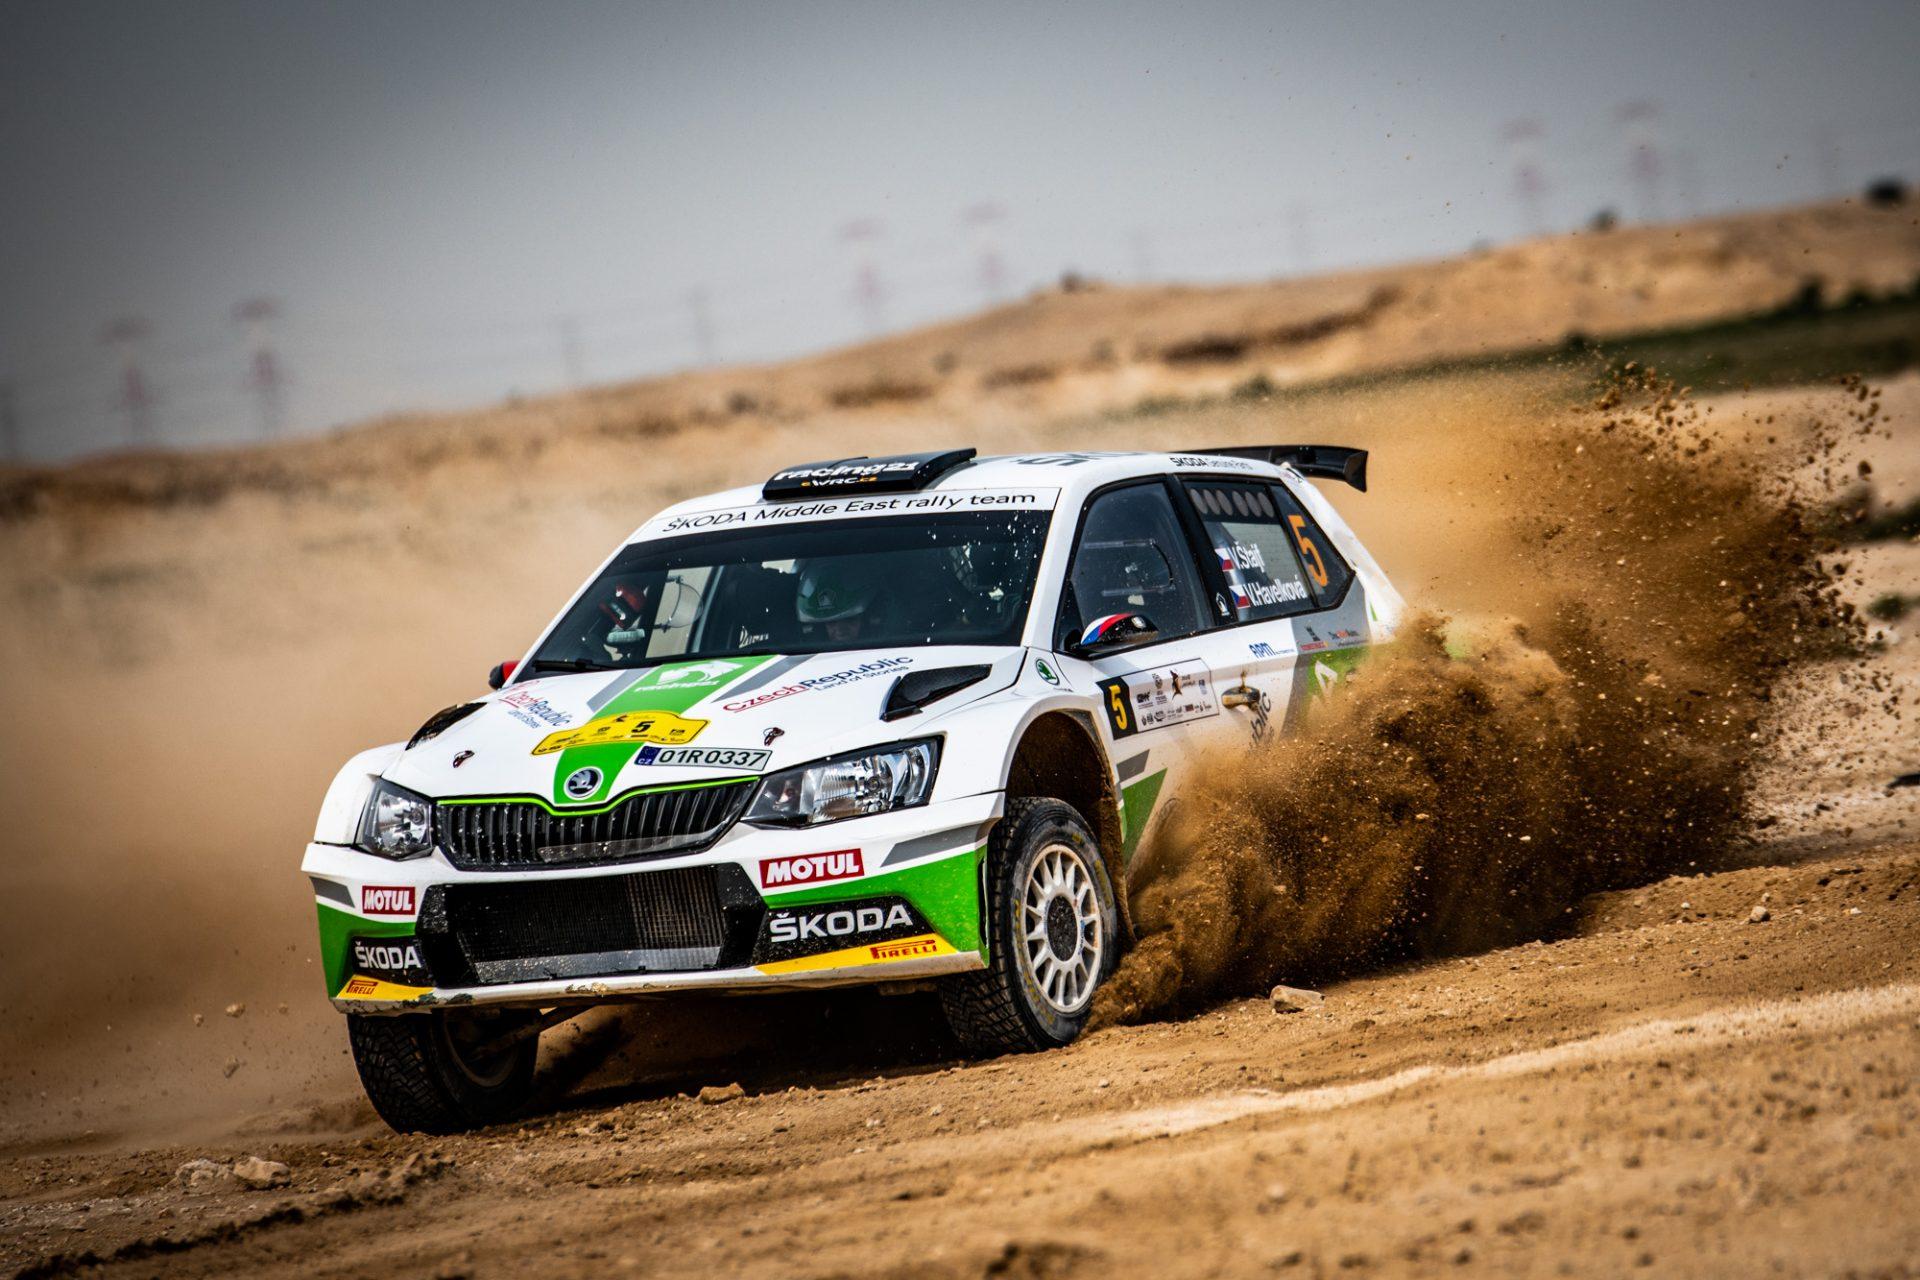 FABIA R5 Crew Štajf/Havelková Rewrites History of Rally of Qatar | MERC